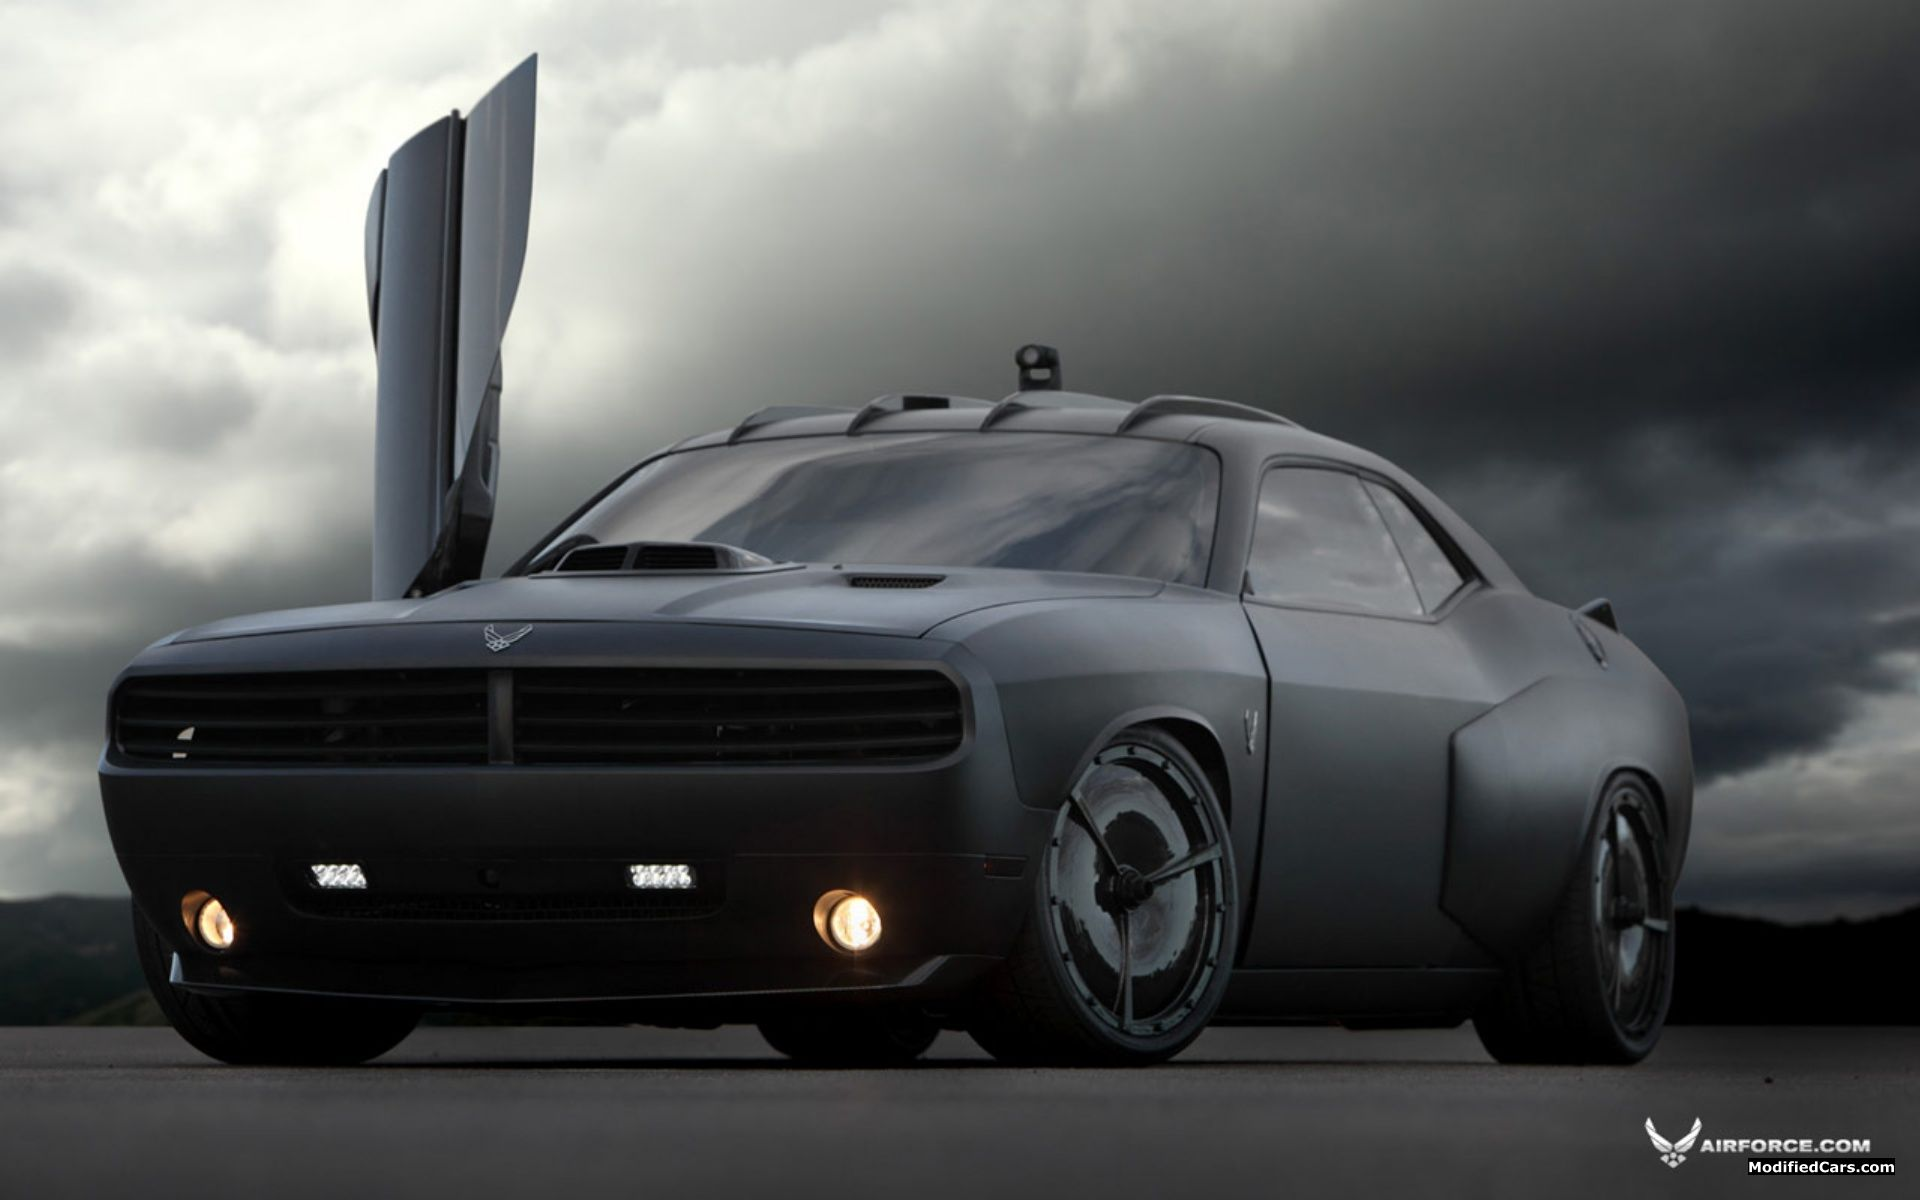 Dodge Challenger Vapor 2010 US Airforce tuned